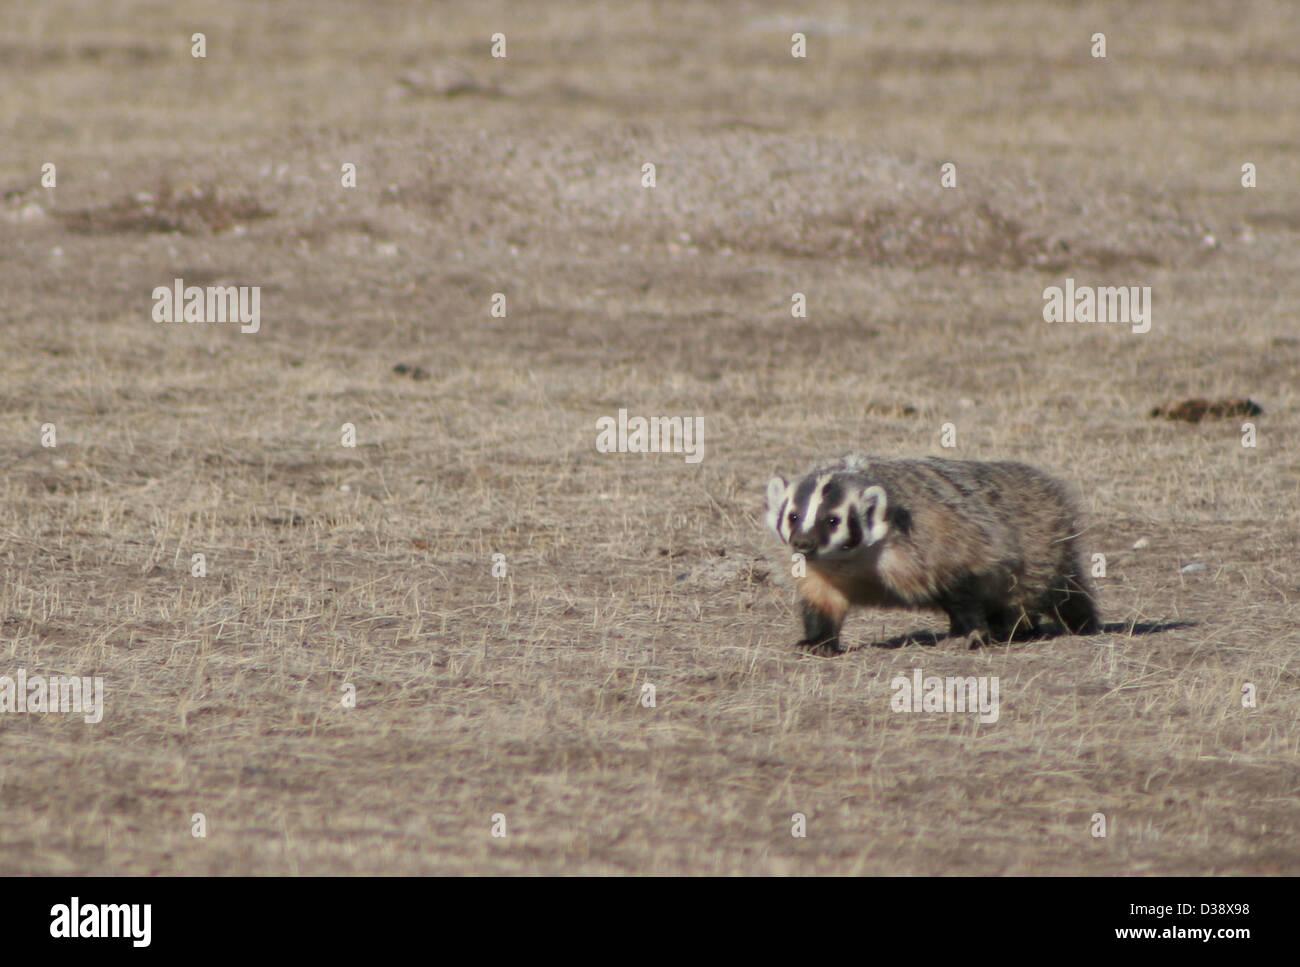 Badger At Roberts Prairie Dog Town Stock Photo 53671332 Alamy